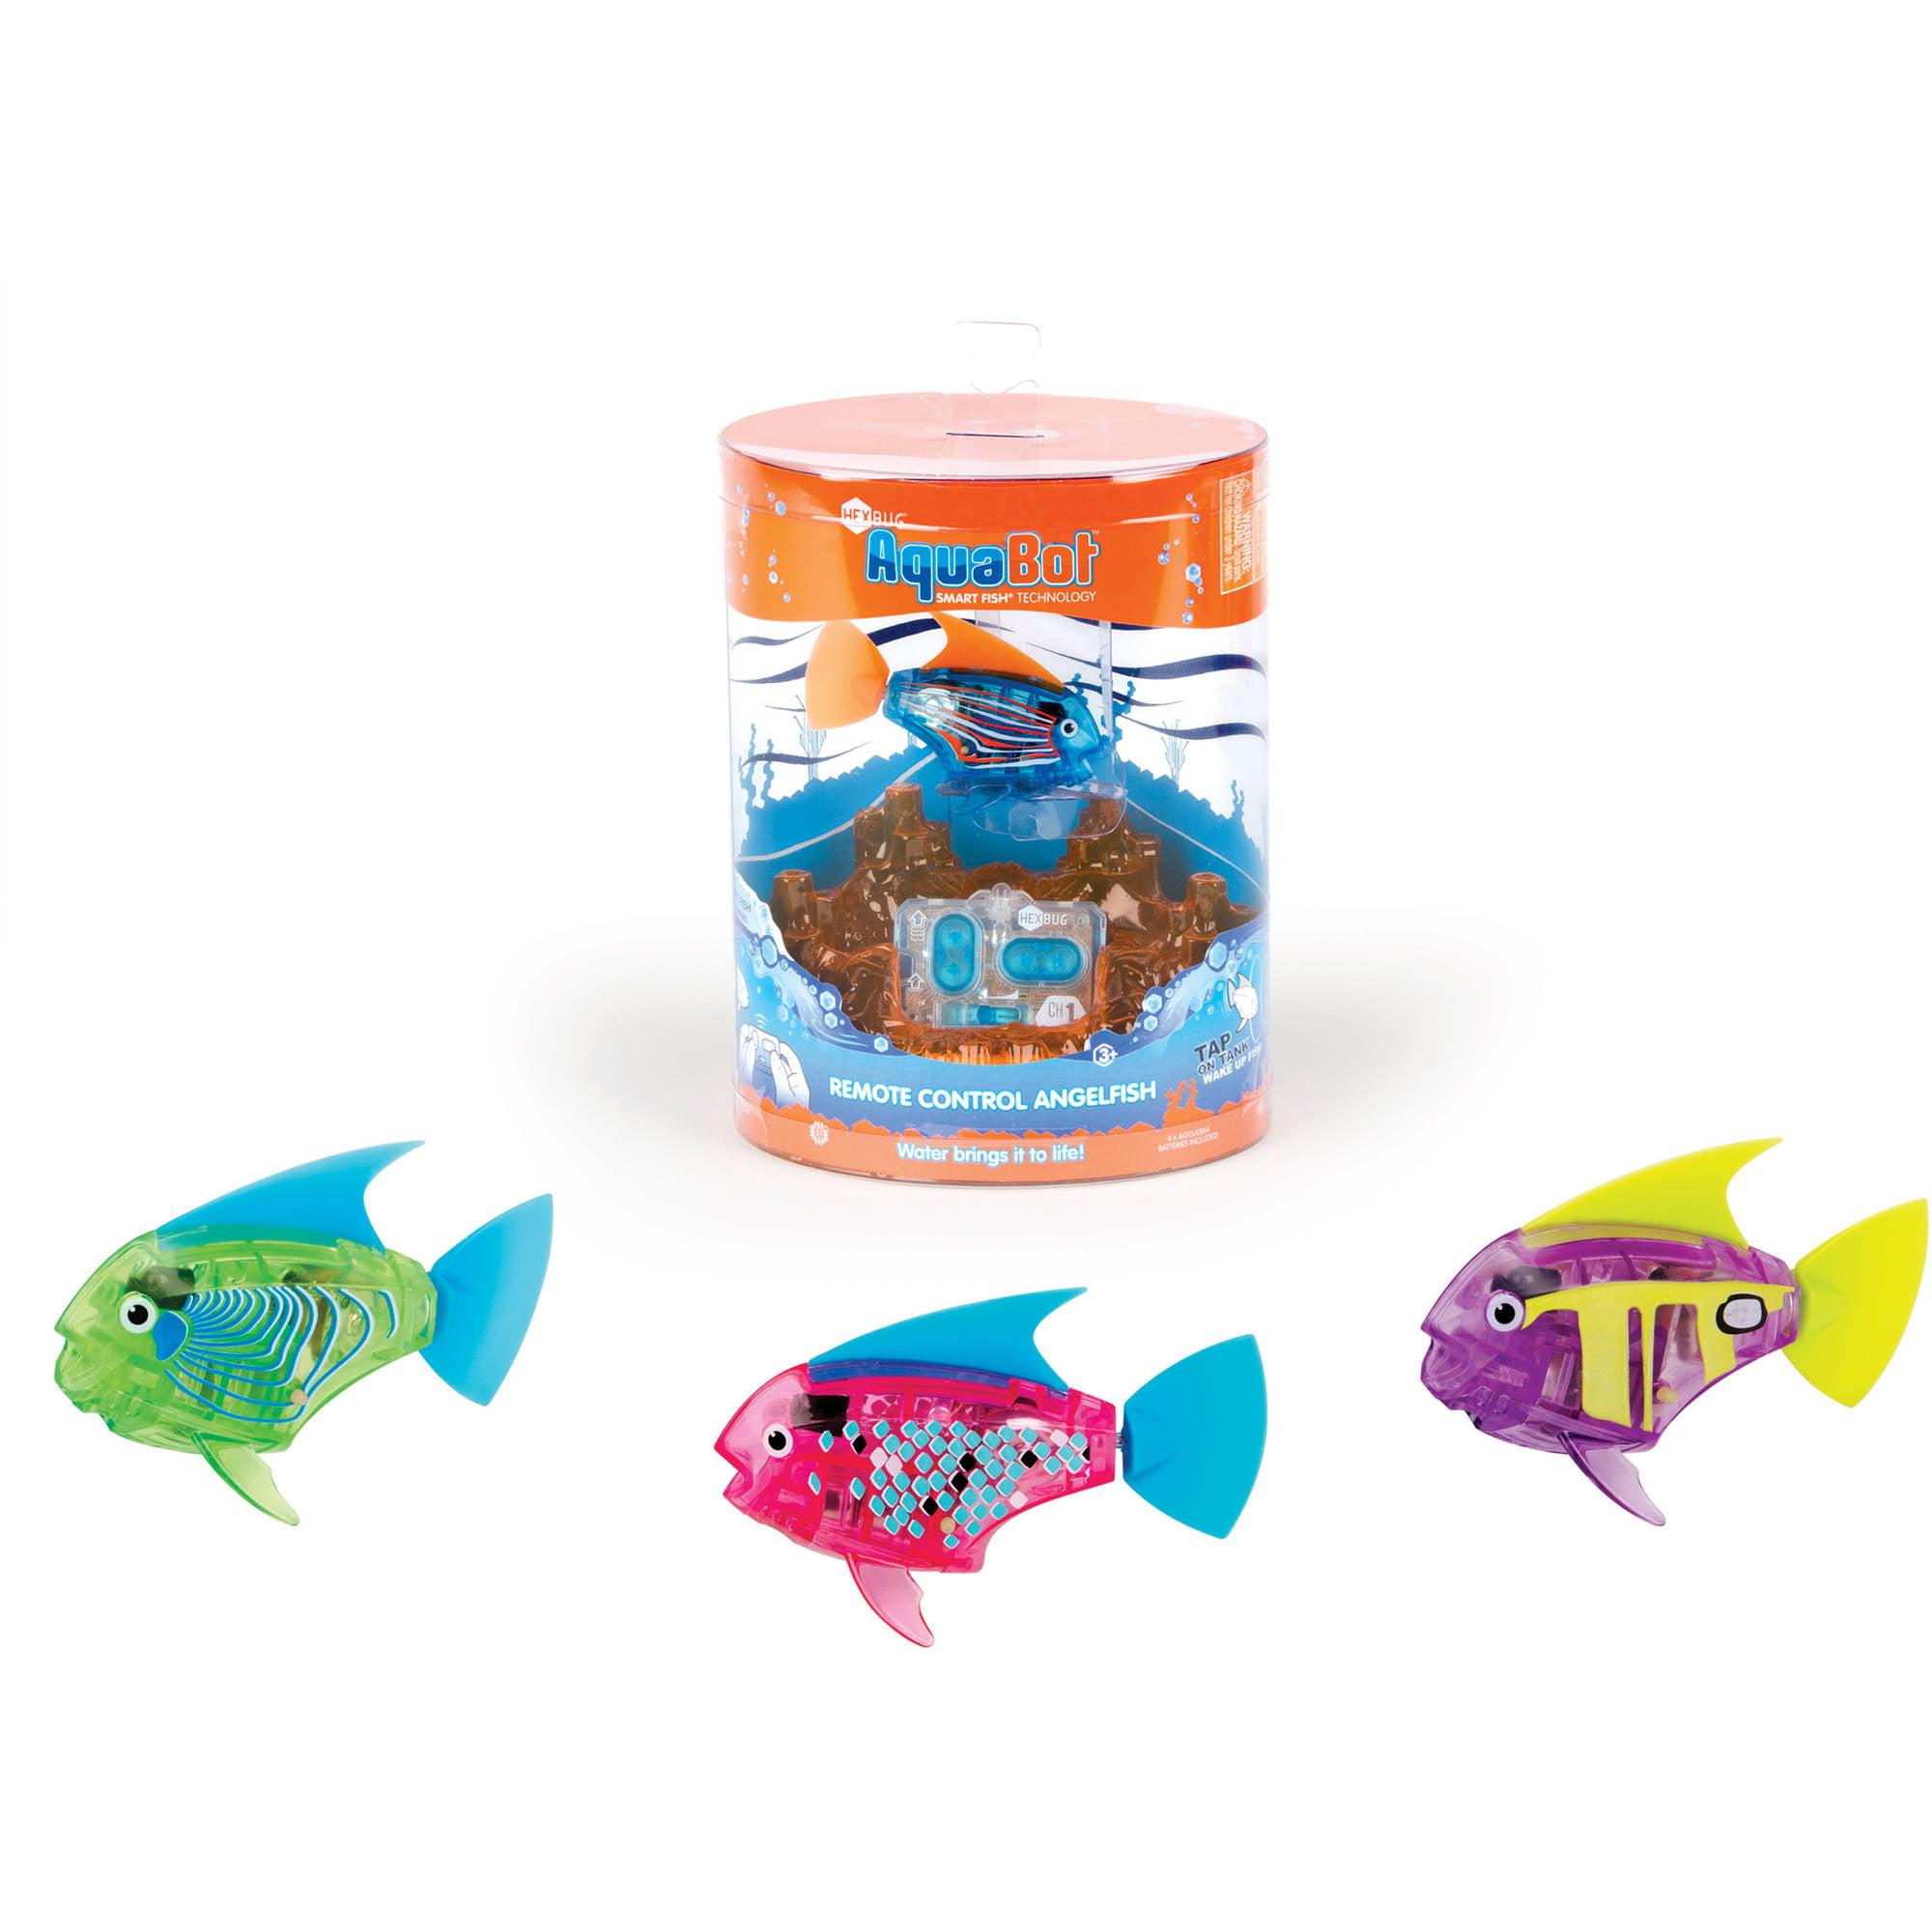 HEXBUG AquaBot Remote Control Angelfish, Colors and Deco May Vary